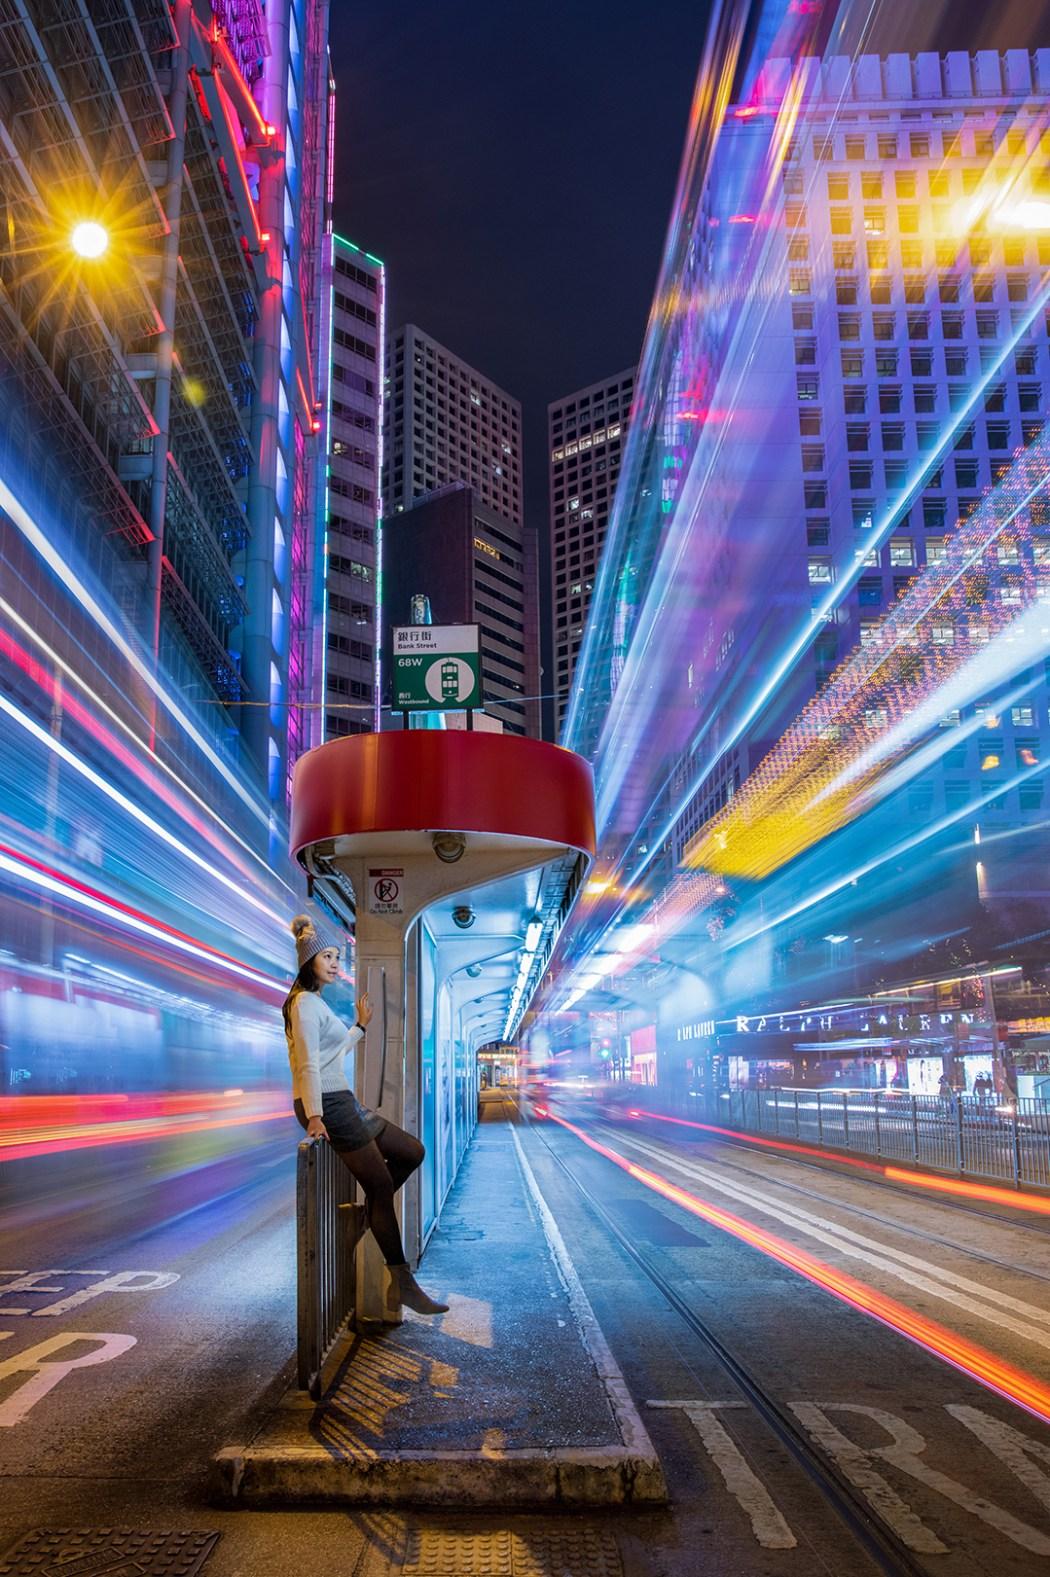 Hong Kong night neon street